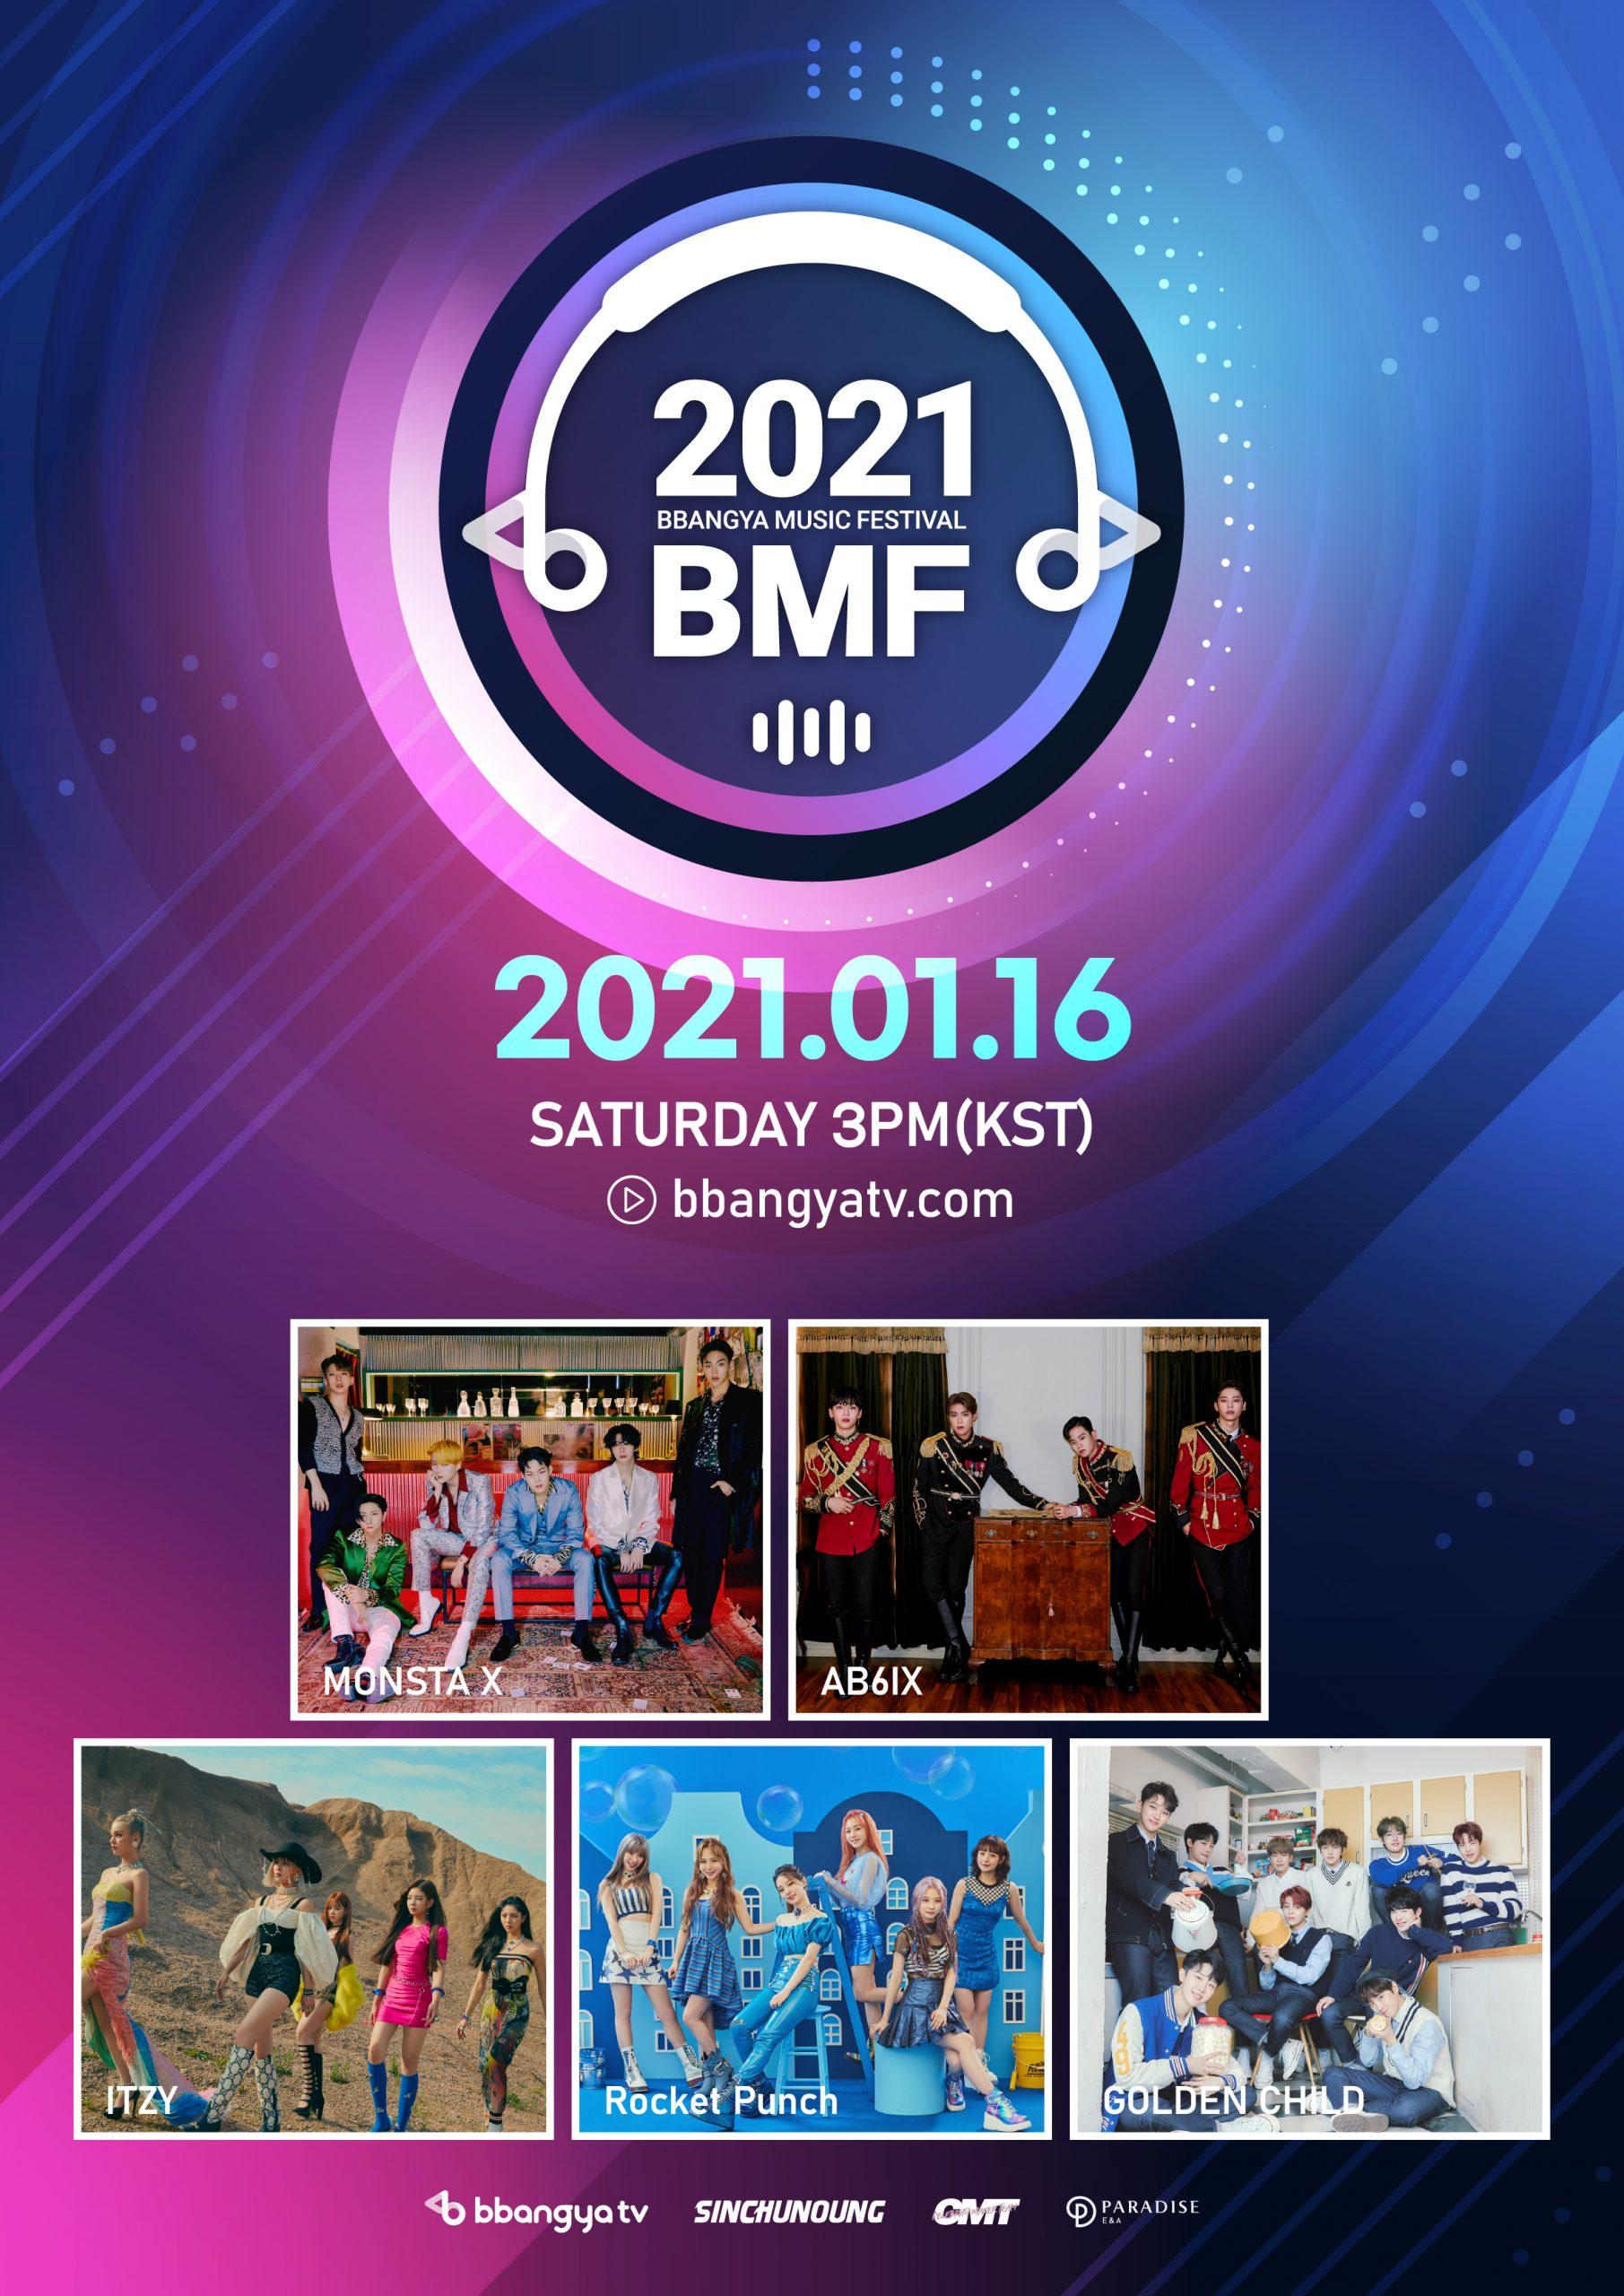 2021 BMF (2021 BBANGYA MUSIC FESTIVAL)